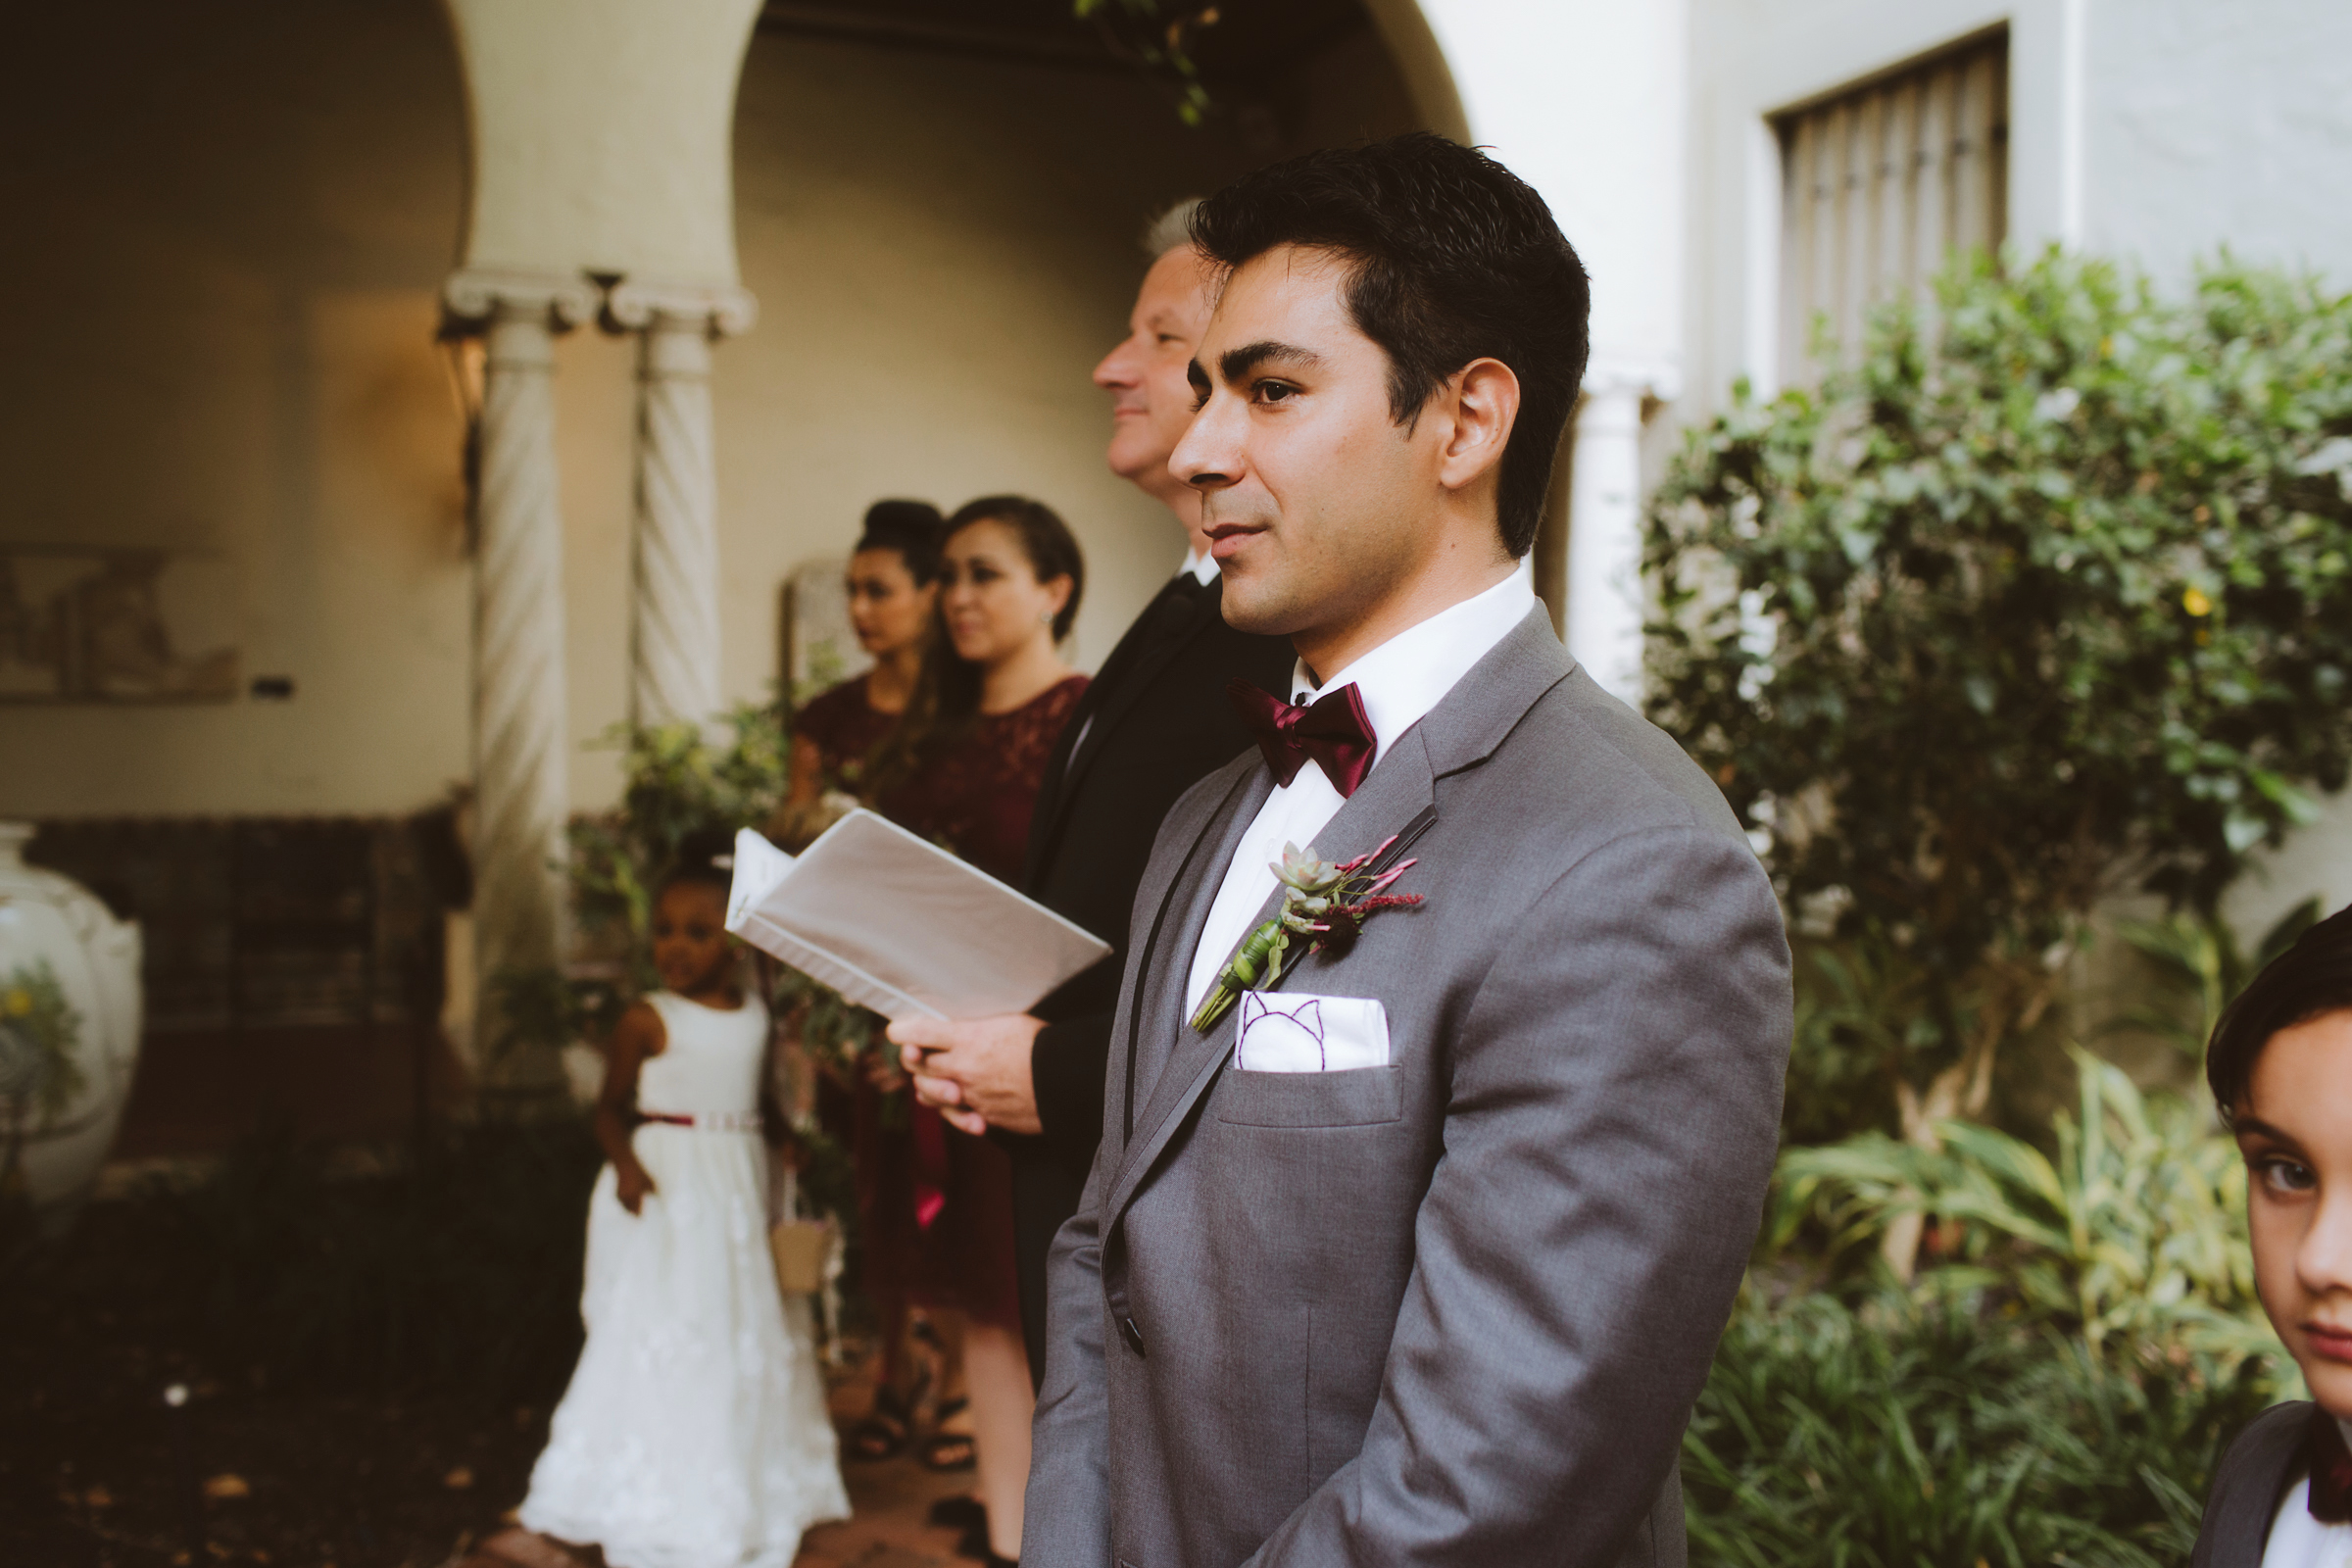 wedding day | MFA St Pete | Vanessa Boy Photography | vanessaboy.com-322.com |final.jpg